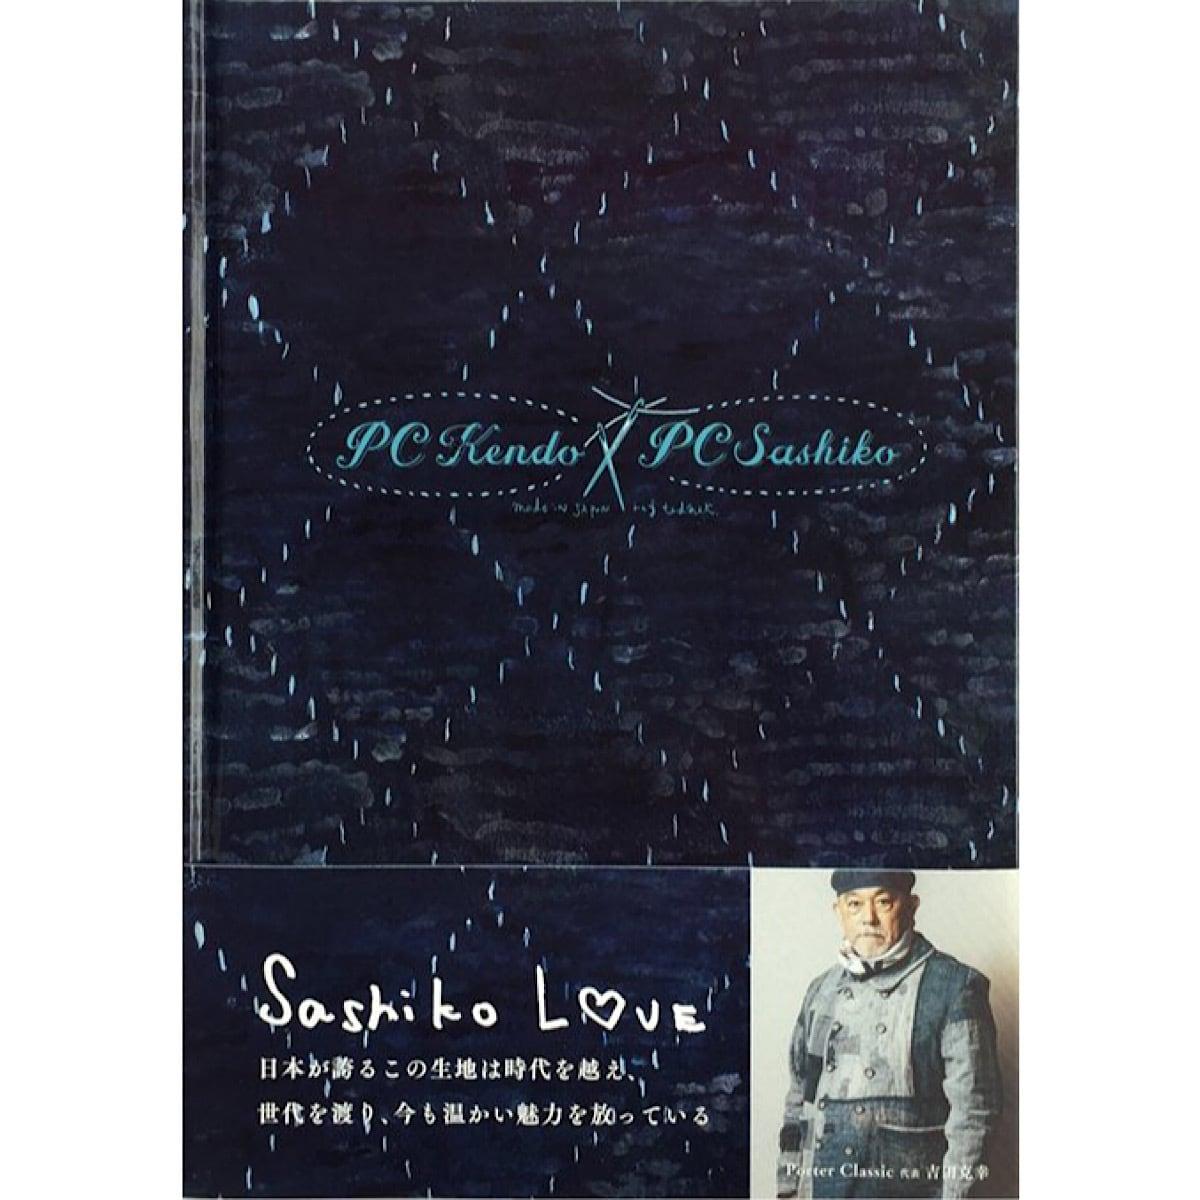 PC KENDO & PC SASHIKO BOOK